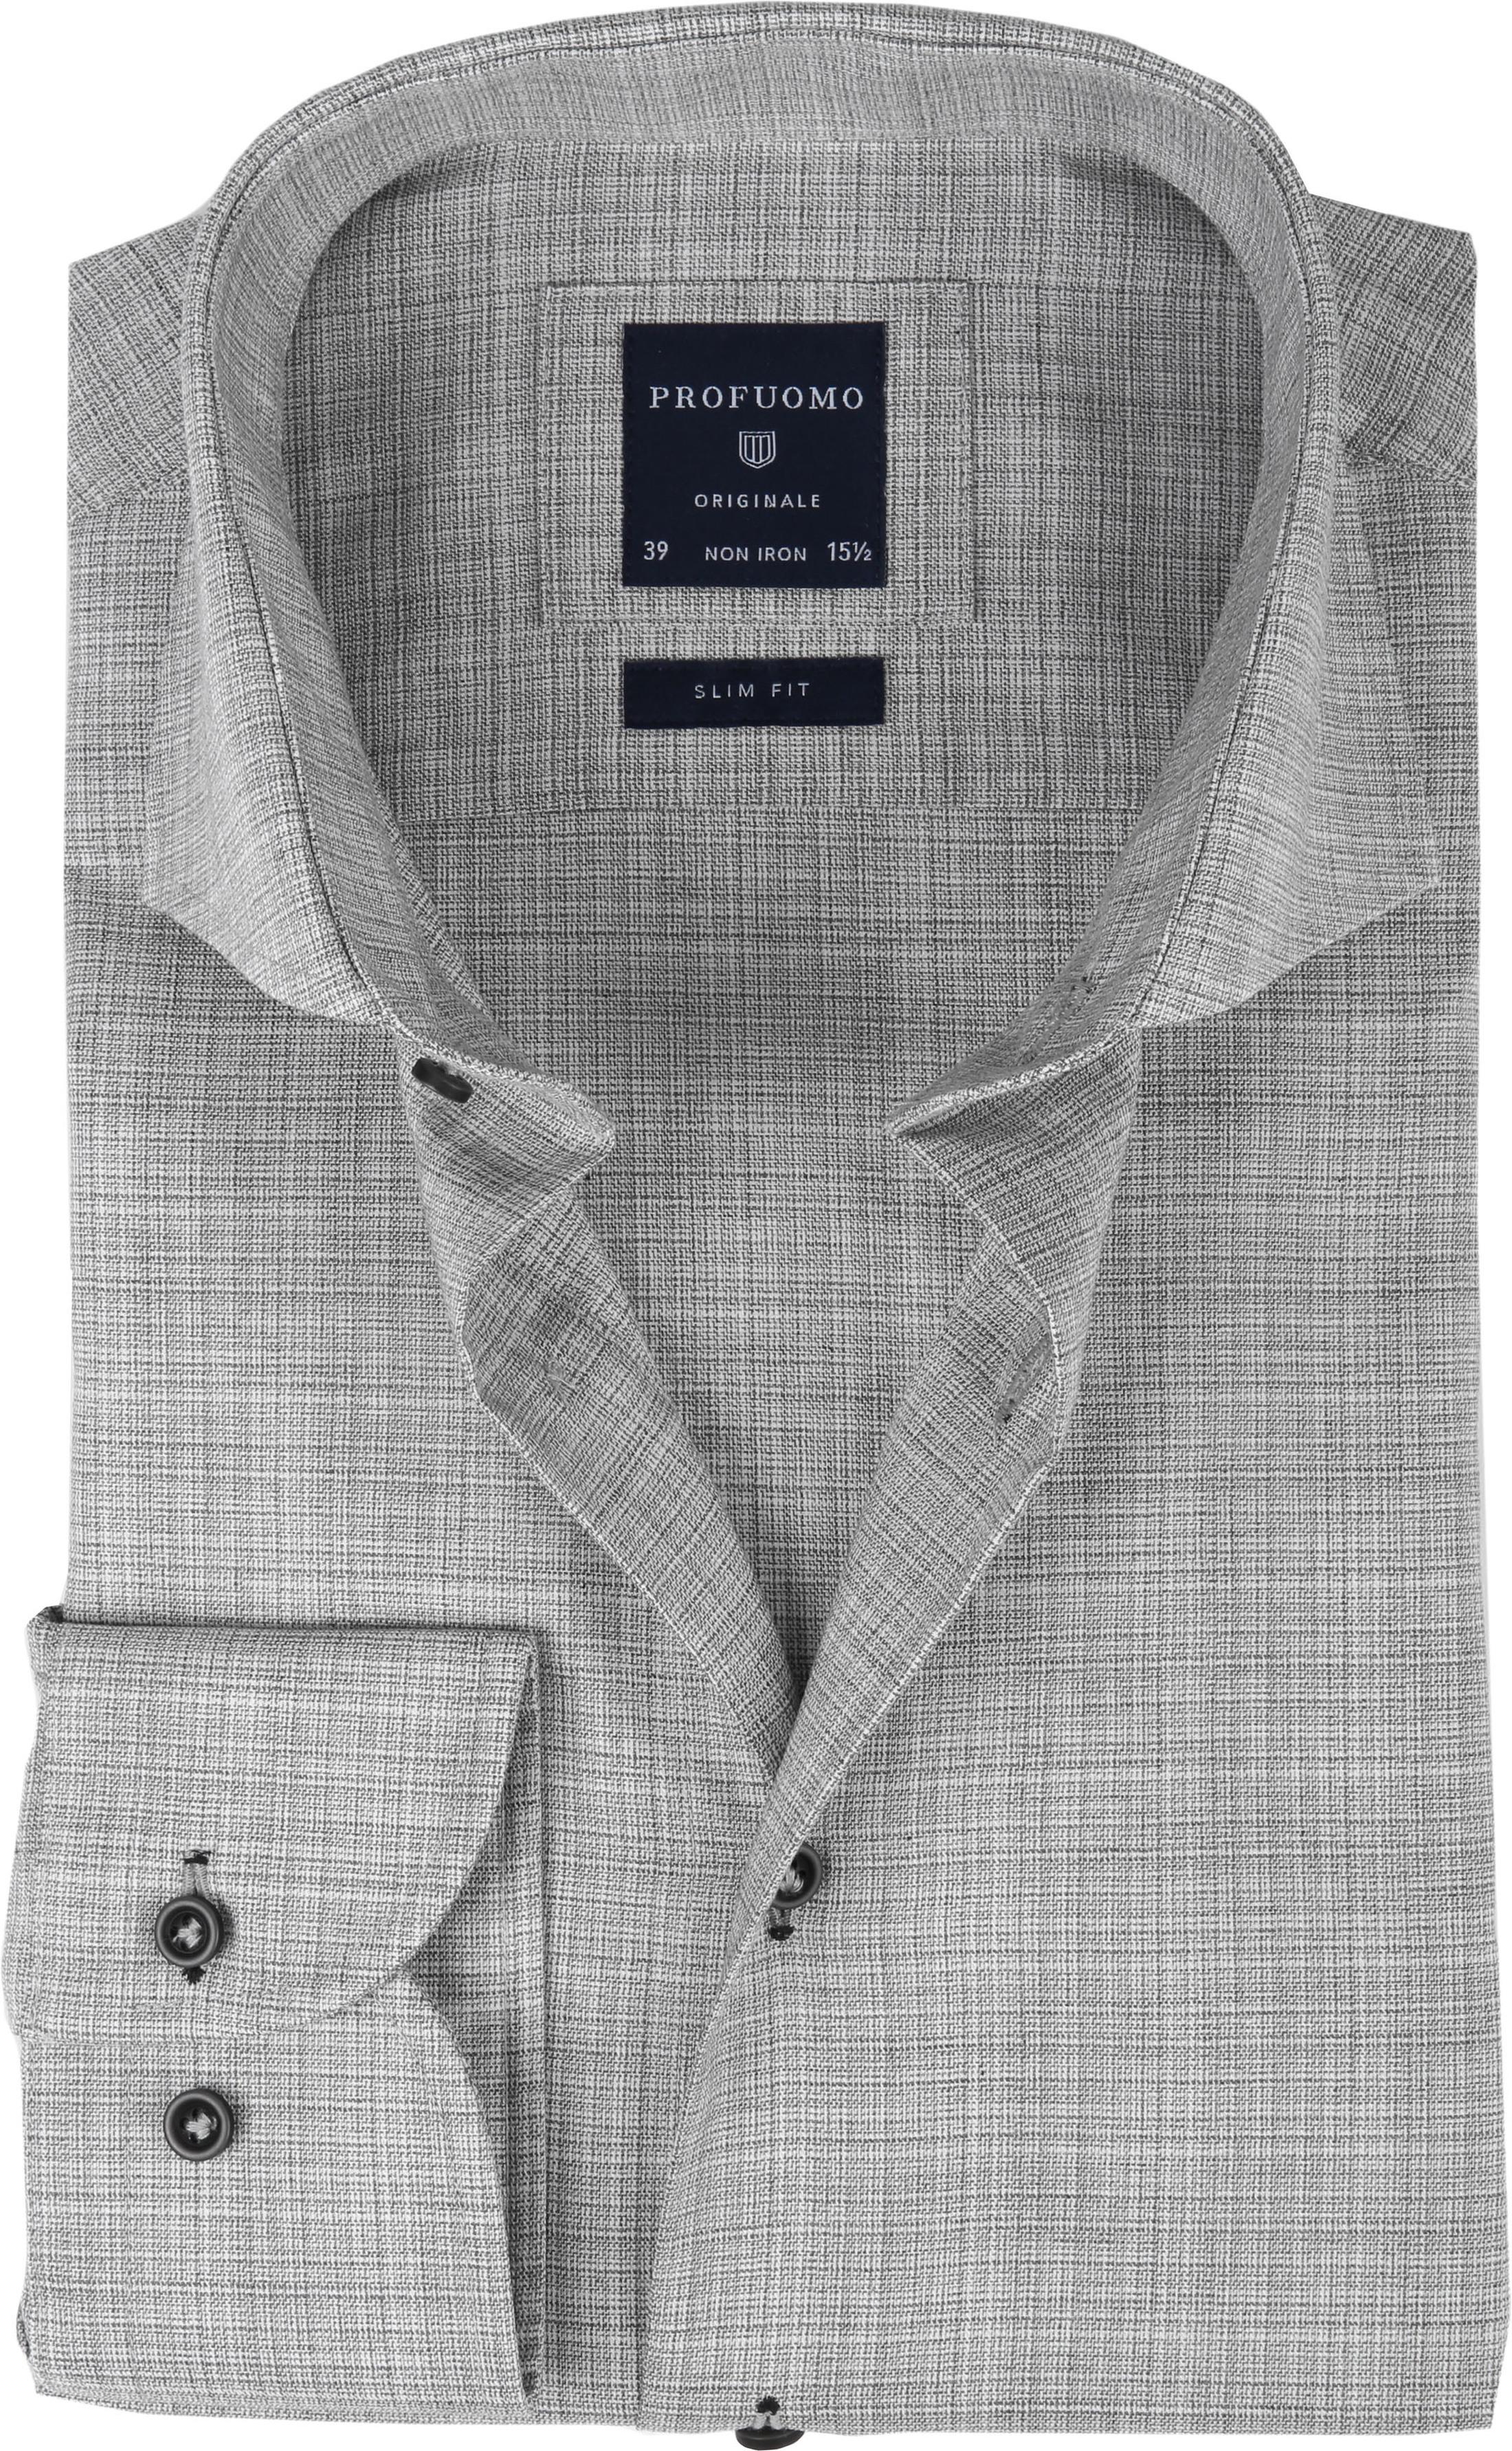 Profuomo Overhemd CAW Melange Grijs foto 0